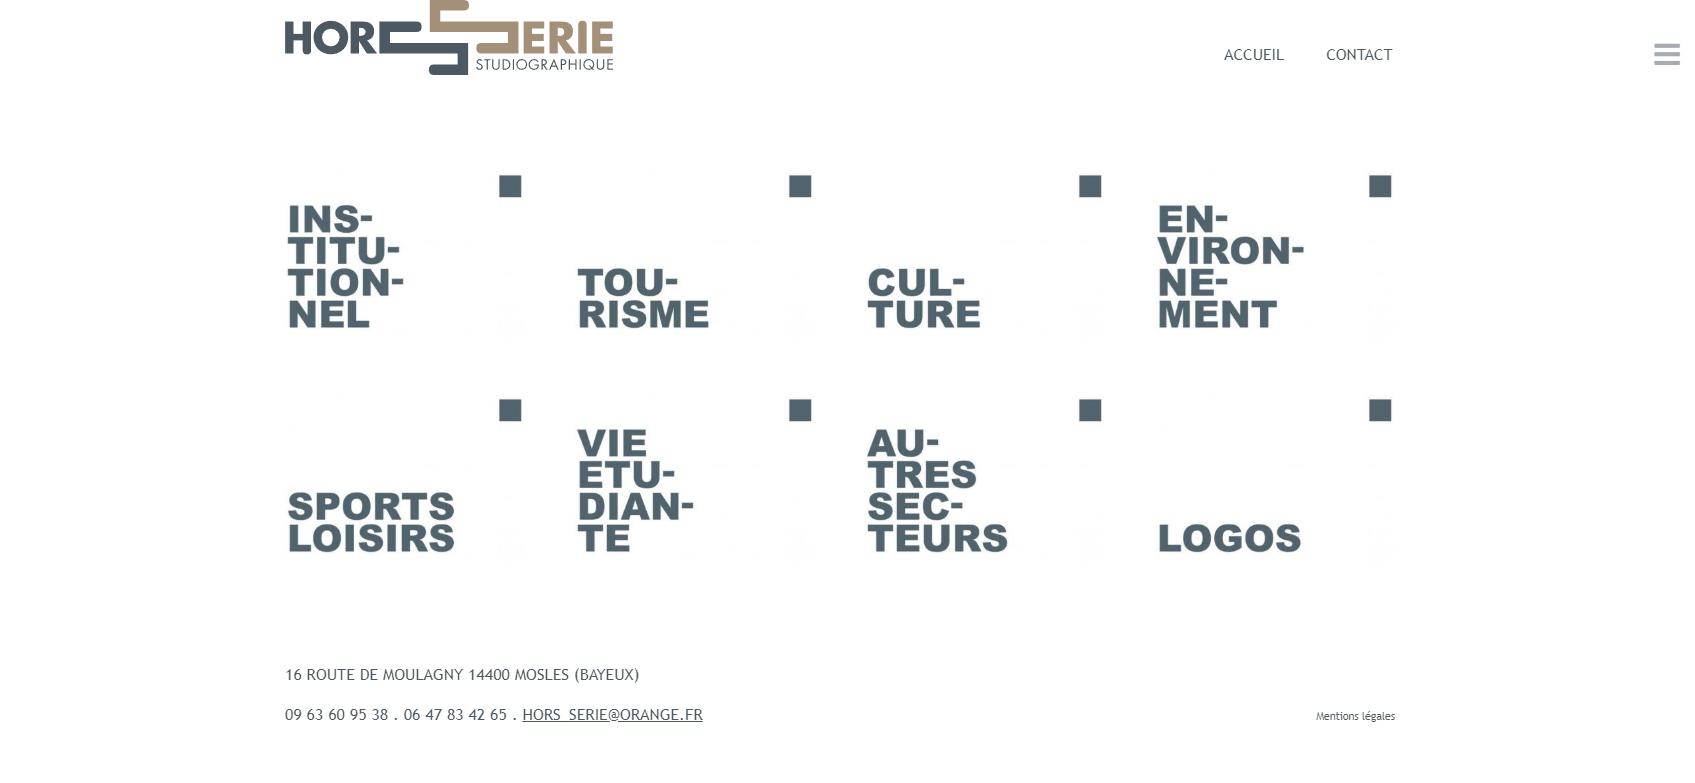 https://studio-hors-serie.fr/docs/zoom%20100%25.png